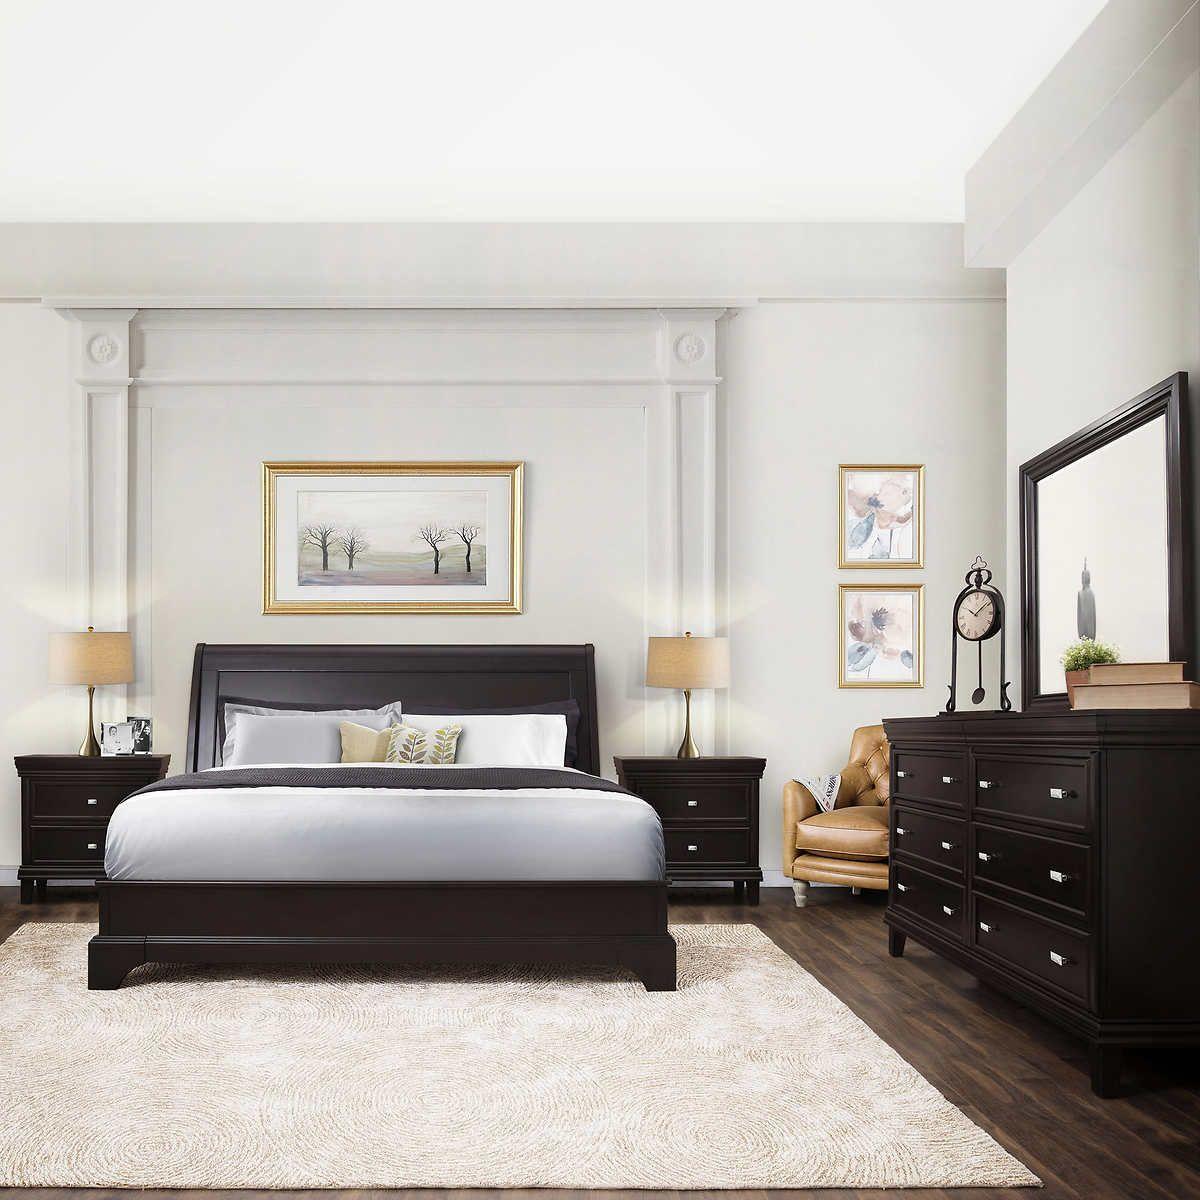 1 kingsizebedroomsetsmodern King bedroom sets, Bedroom